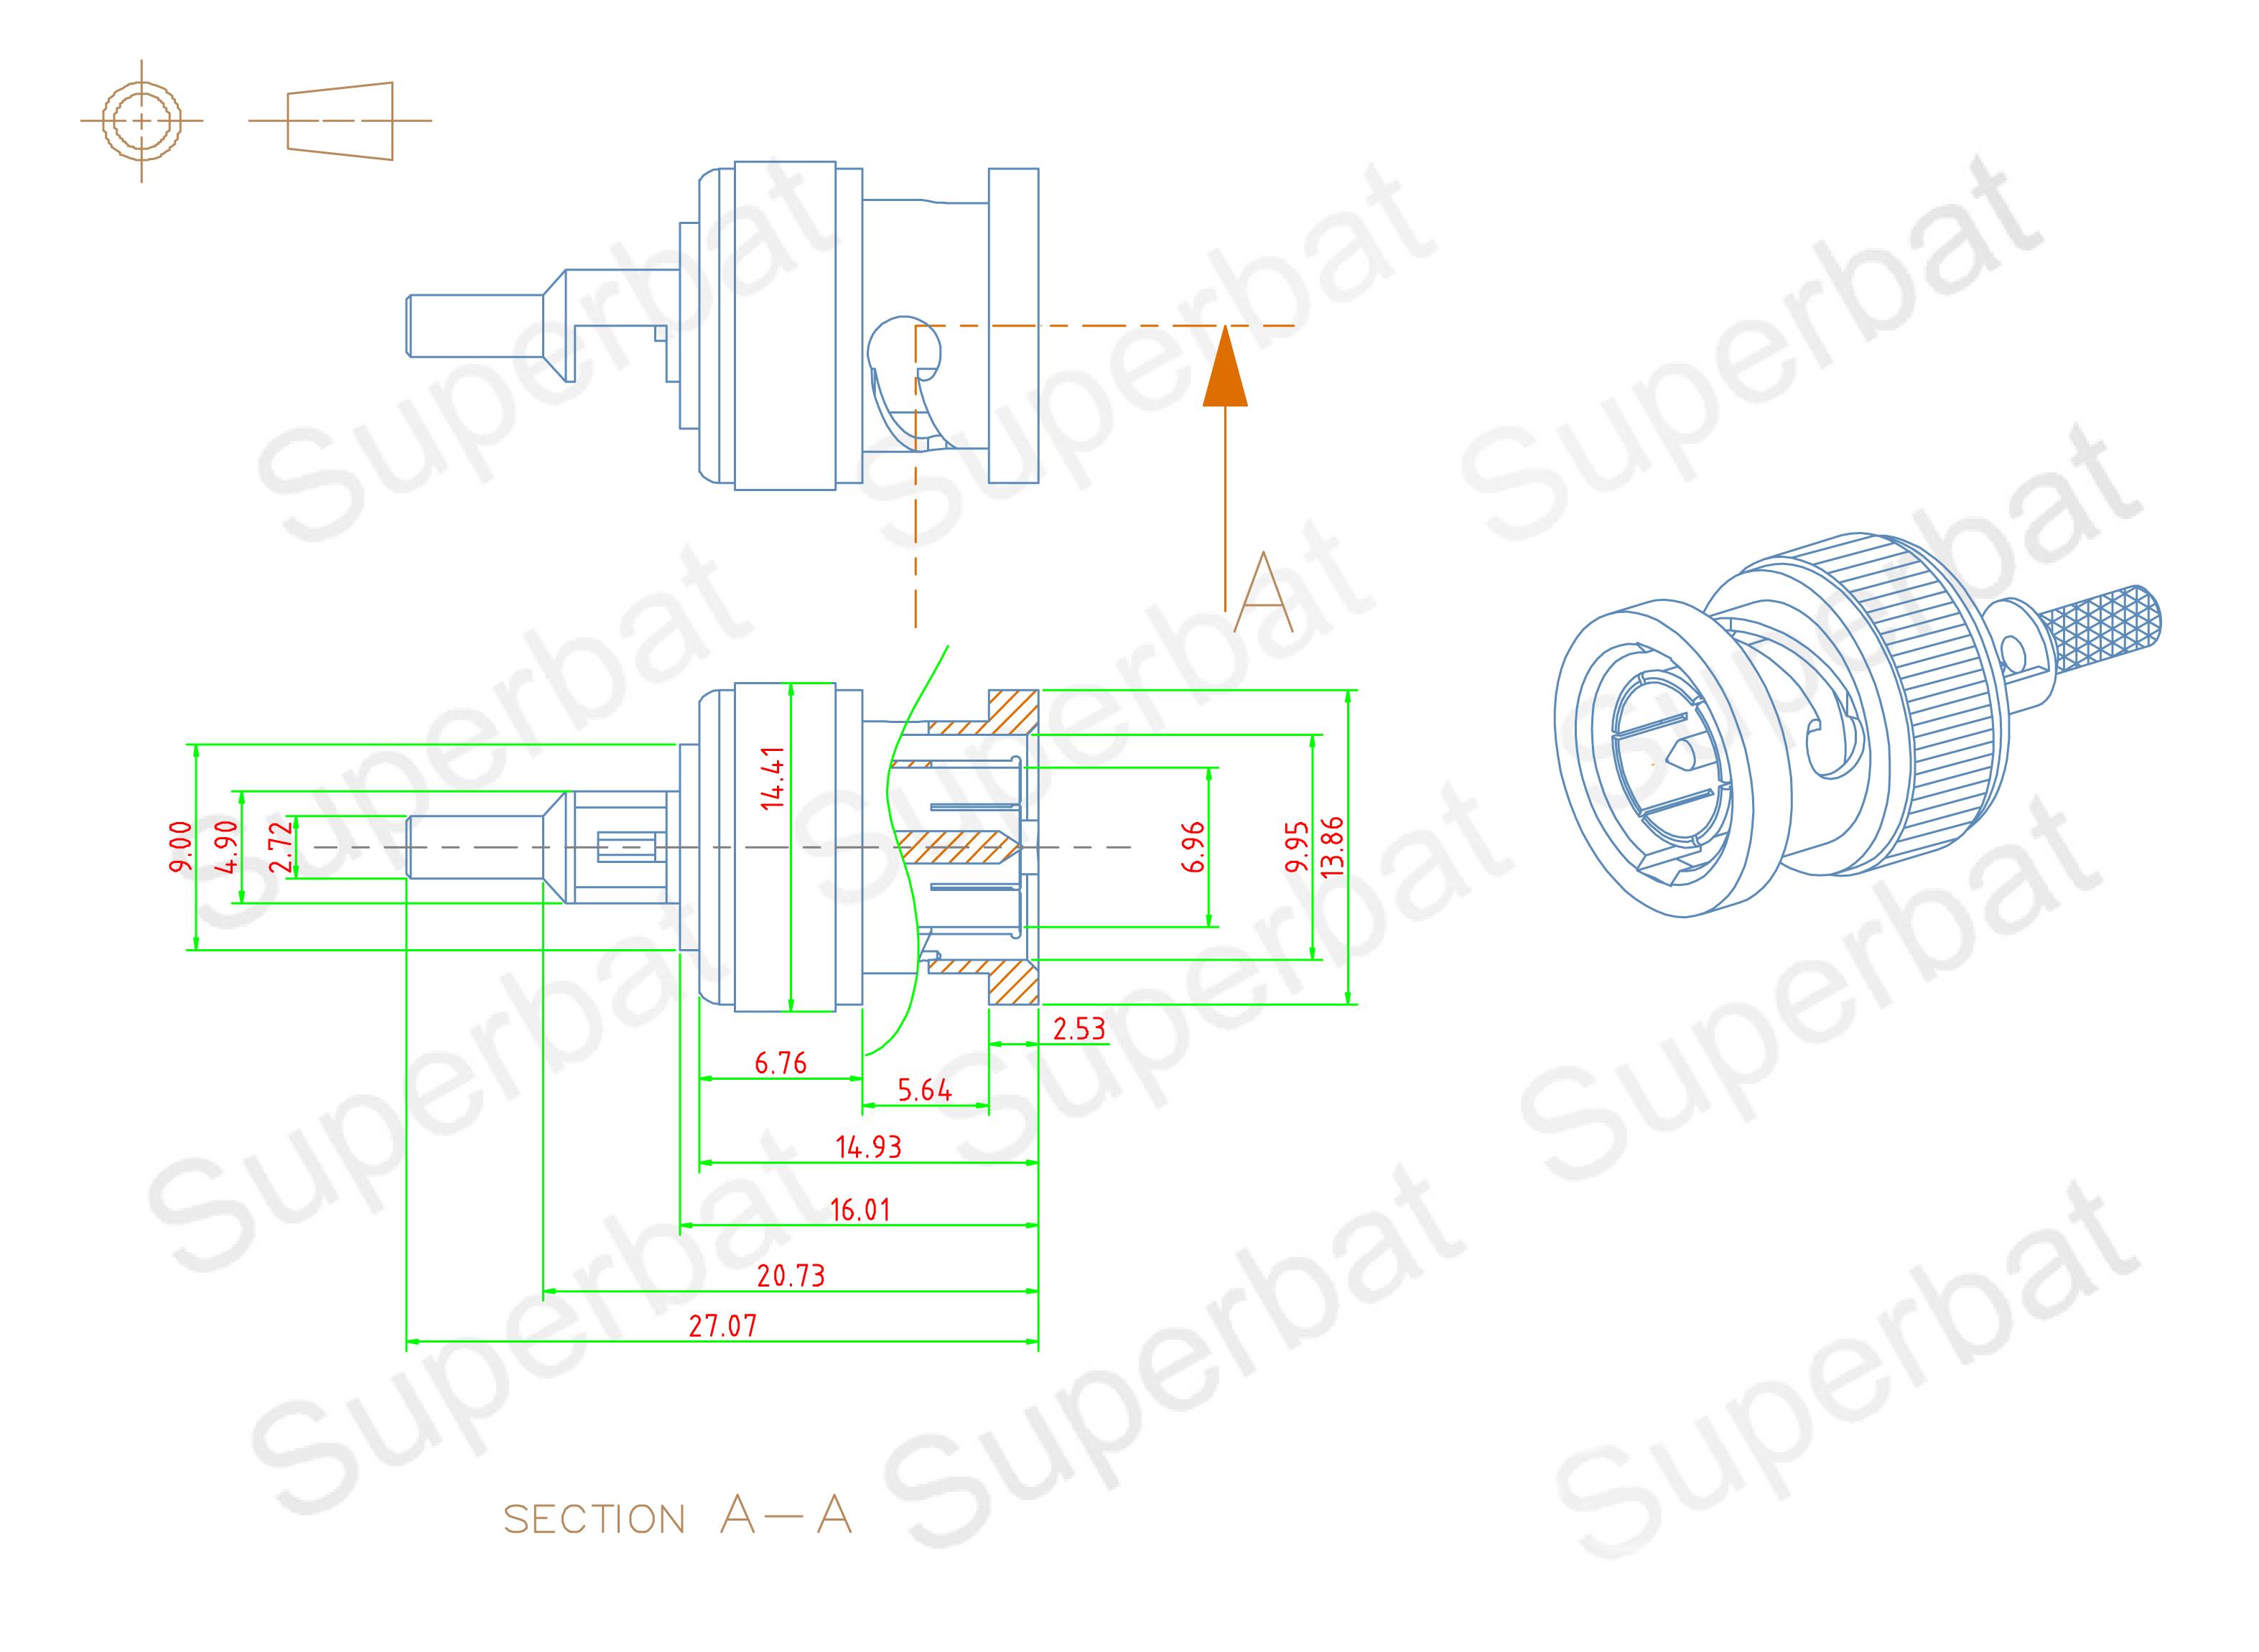 Superbat 75 Bnc Rf Rg174 Rg316 Block Diagram Canonir5000